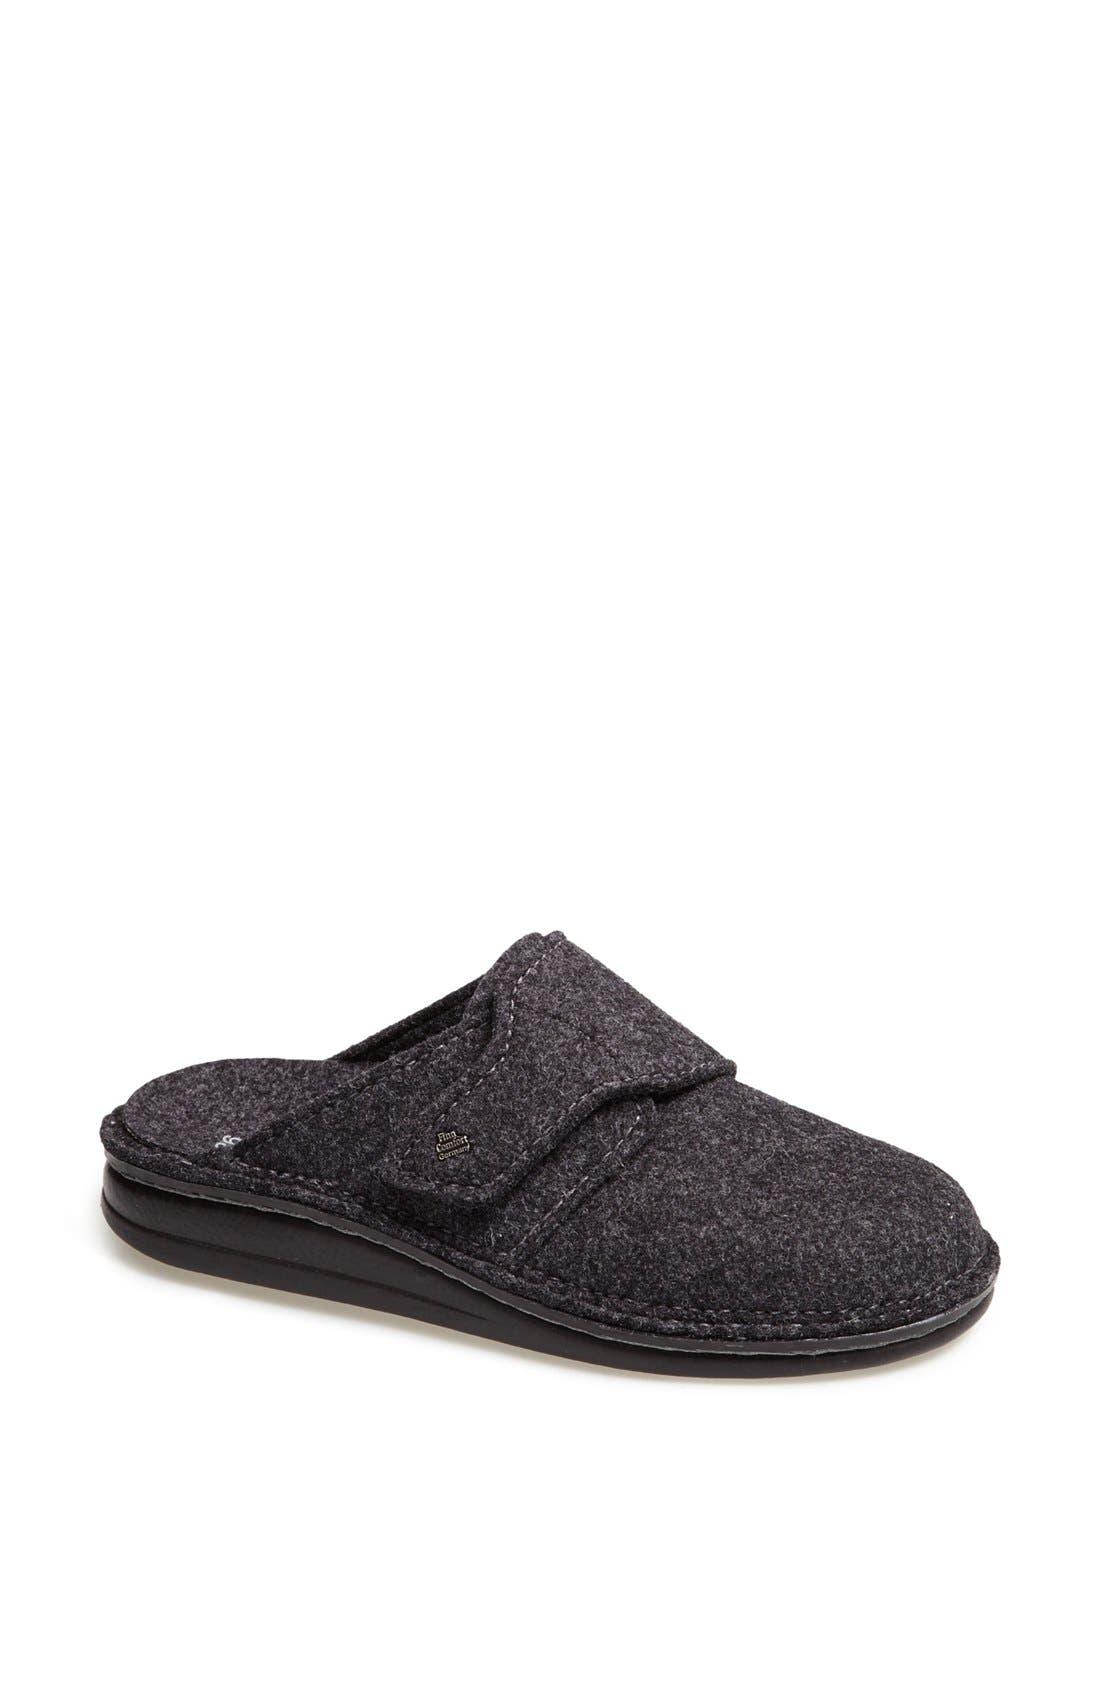 Finn Comfort 'Tirol' Boiled Wool Clog